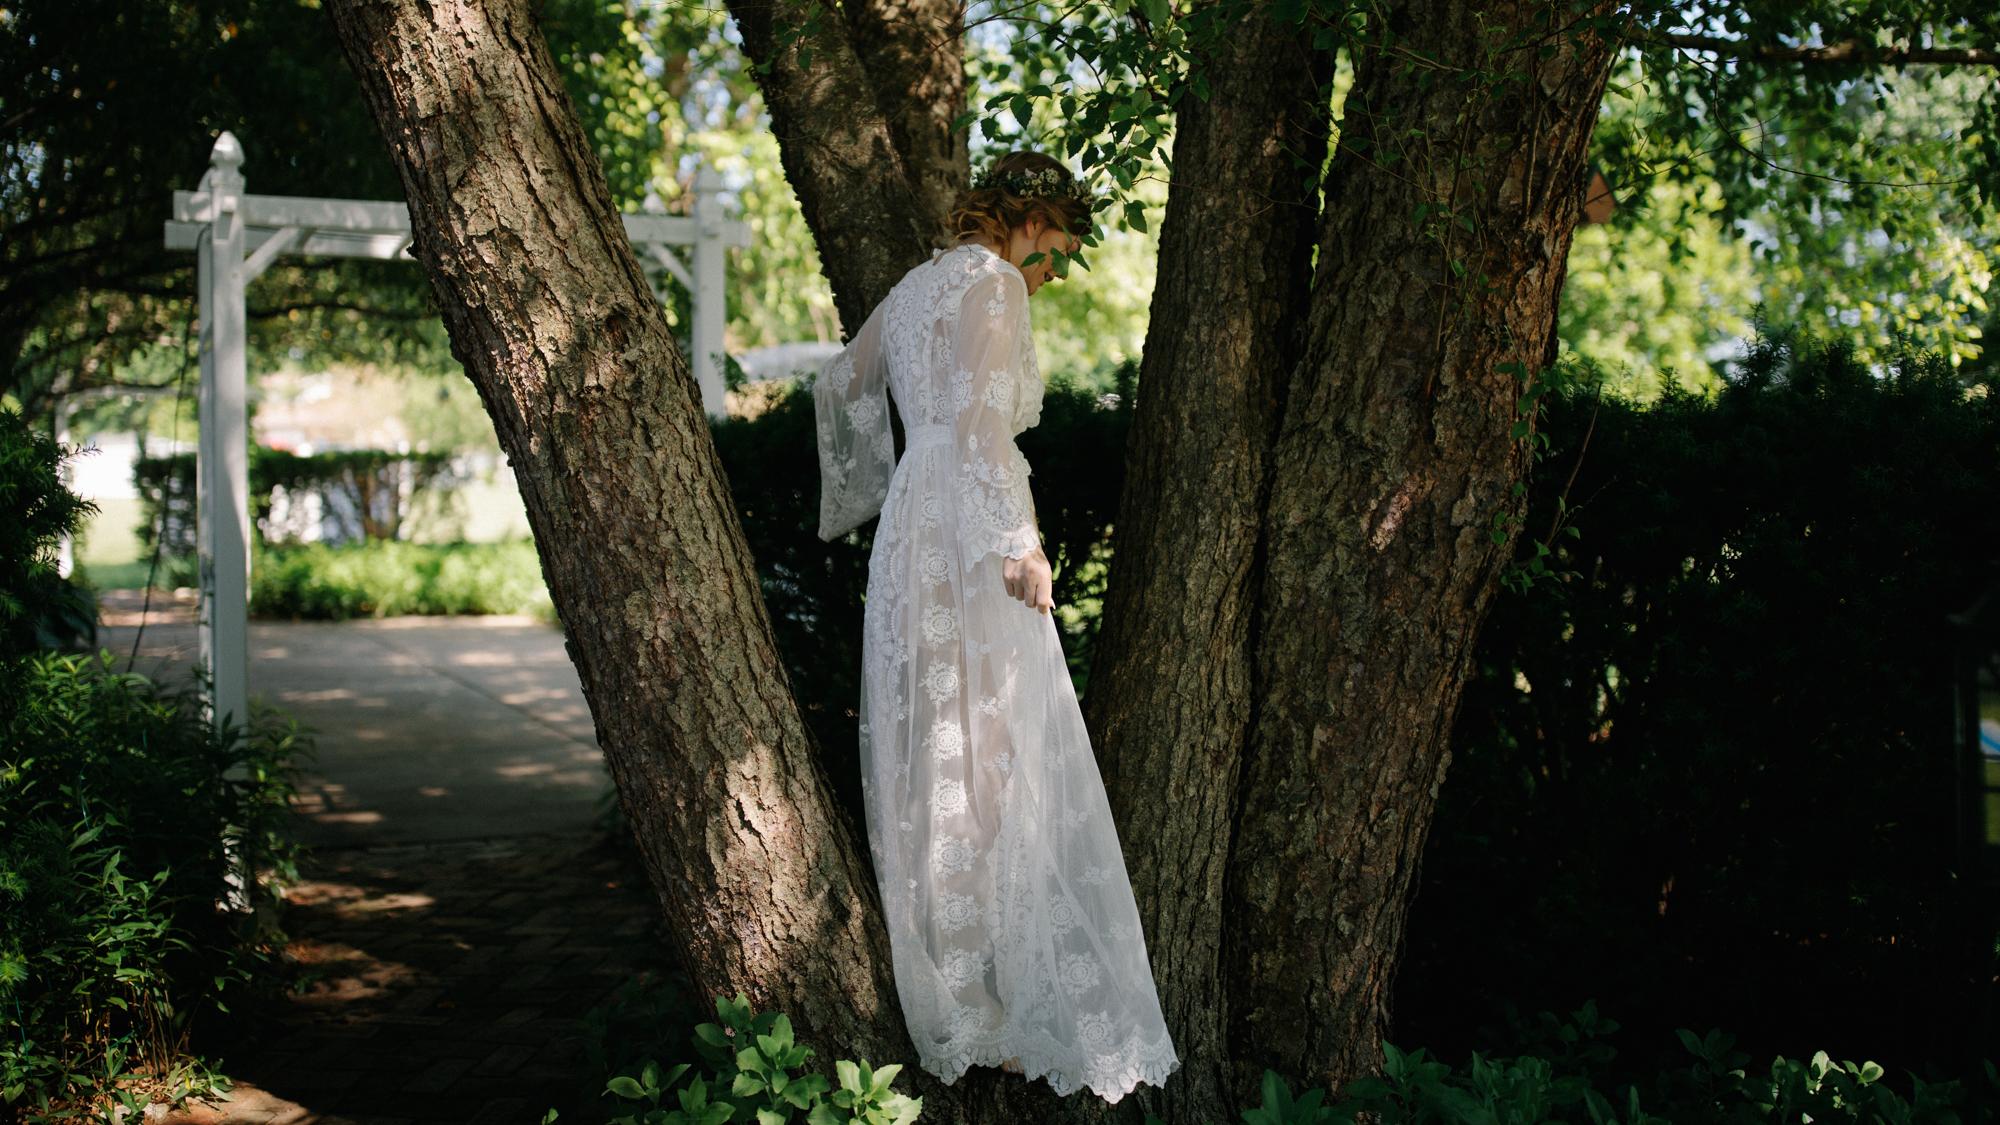 alec_vanderboom_kansas_city_mo_wedding_photos-0029.jpg